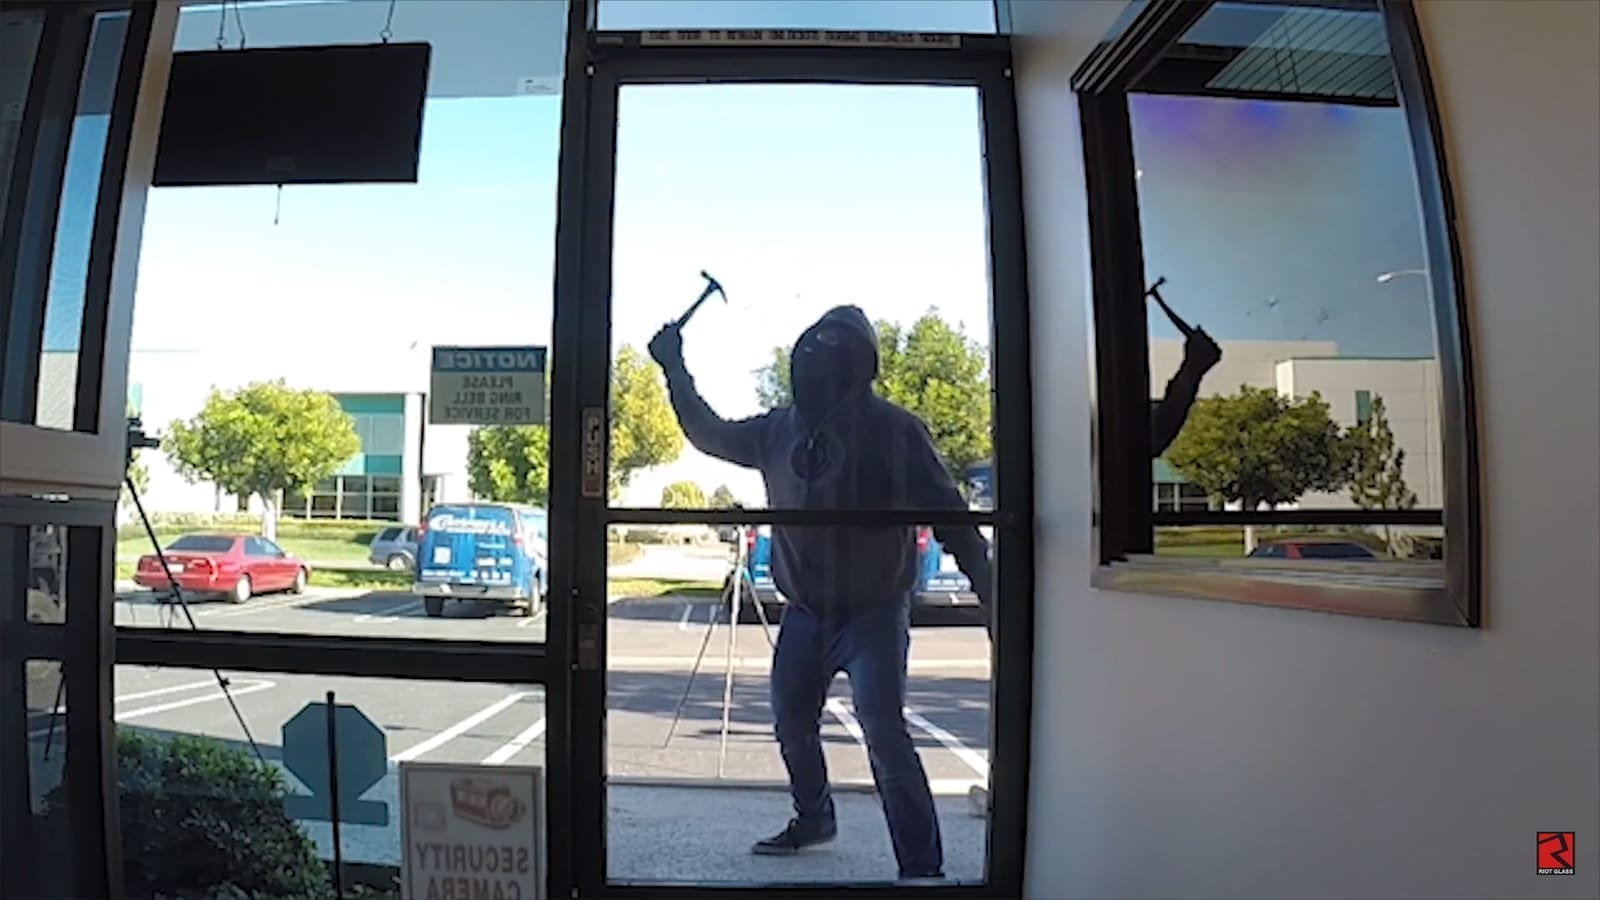 3M Security Window Film Protection in Orlando Florida